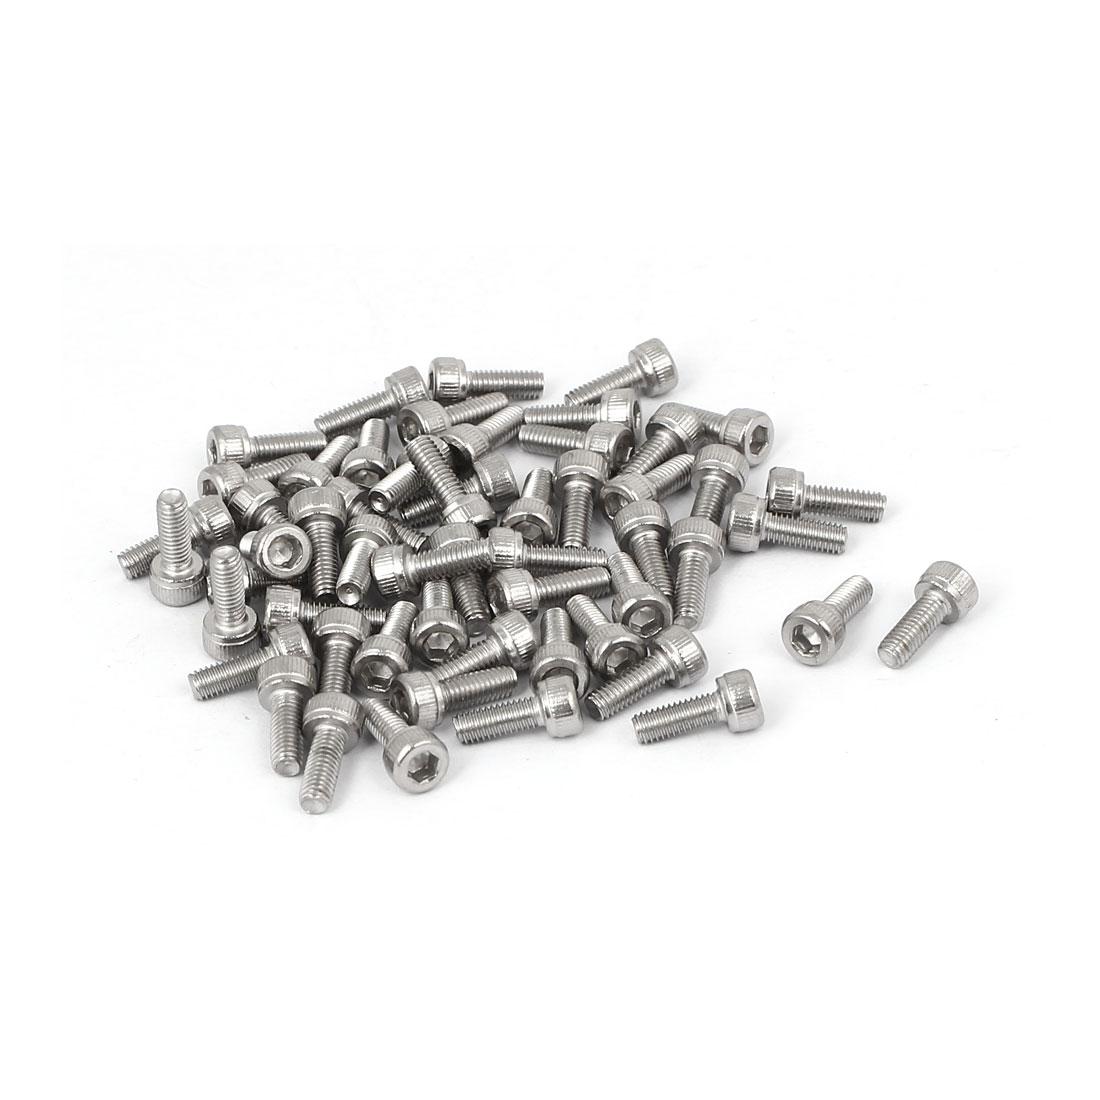 M3x8mm Thread 304 Stainless Steel Hex Socket Head Cap Screw Bolt DIN912 55pcs